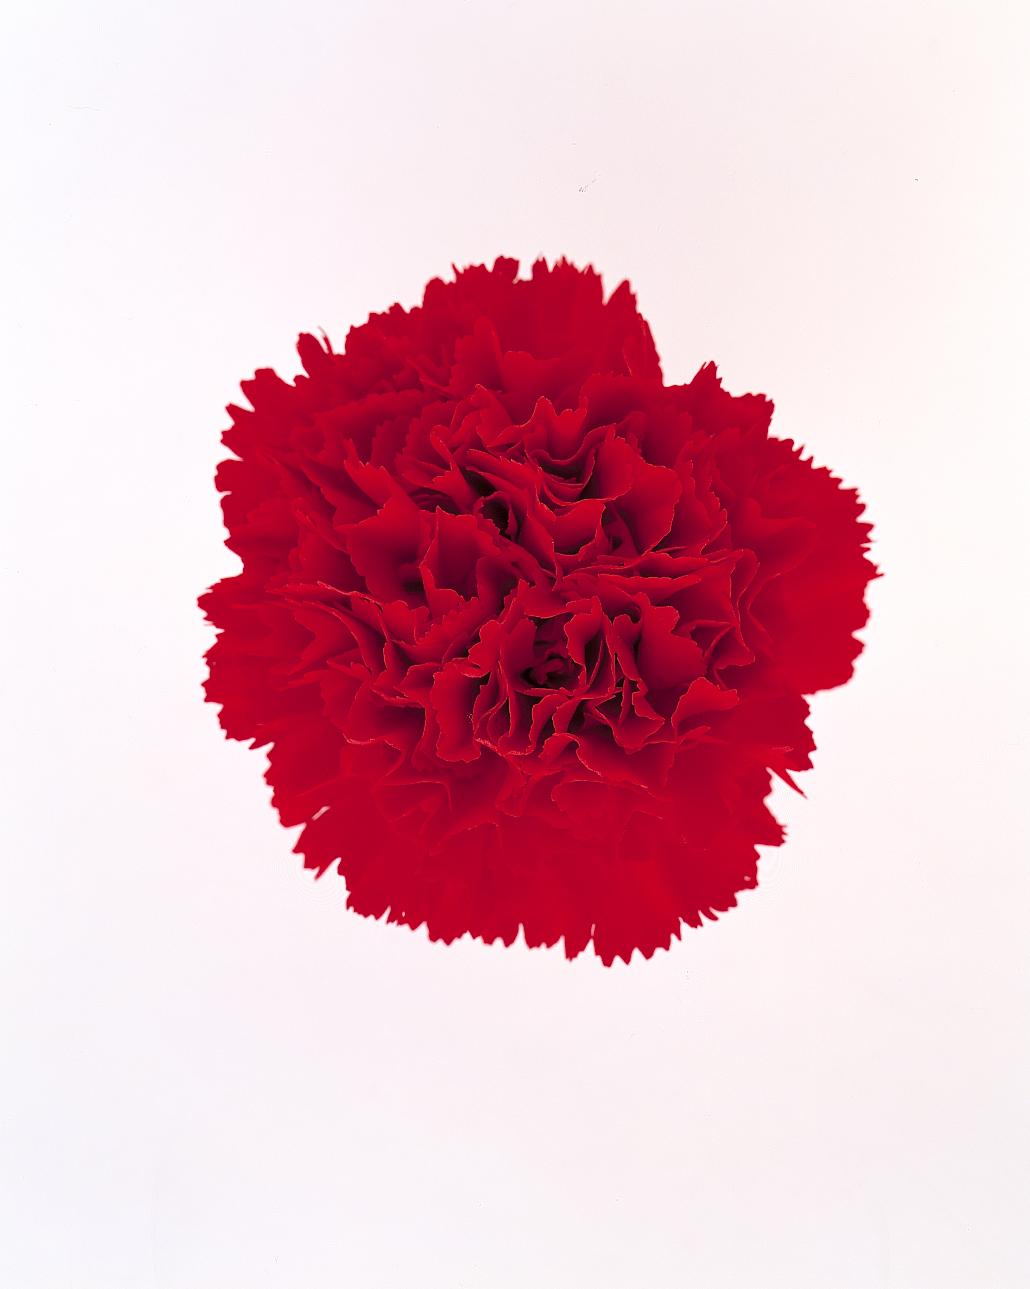 flower-glossary-carnation-red-a98432-0415.jpg